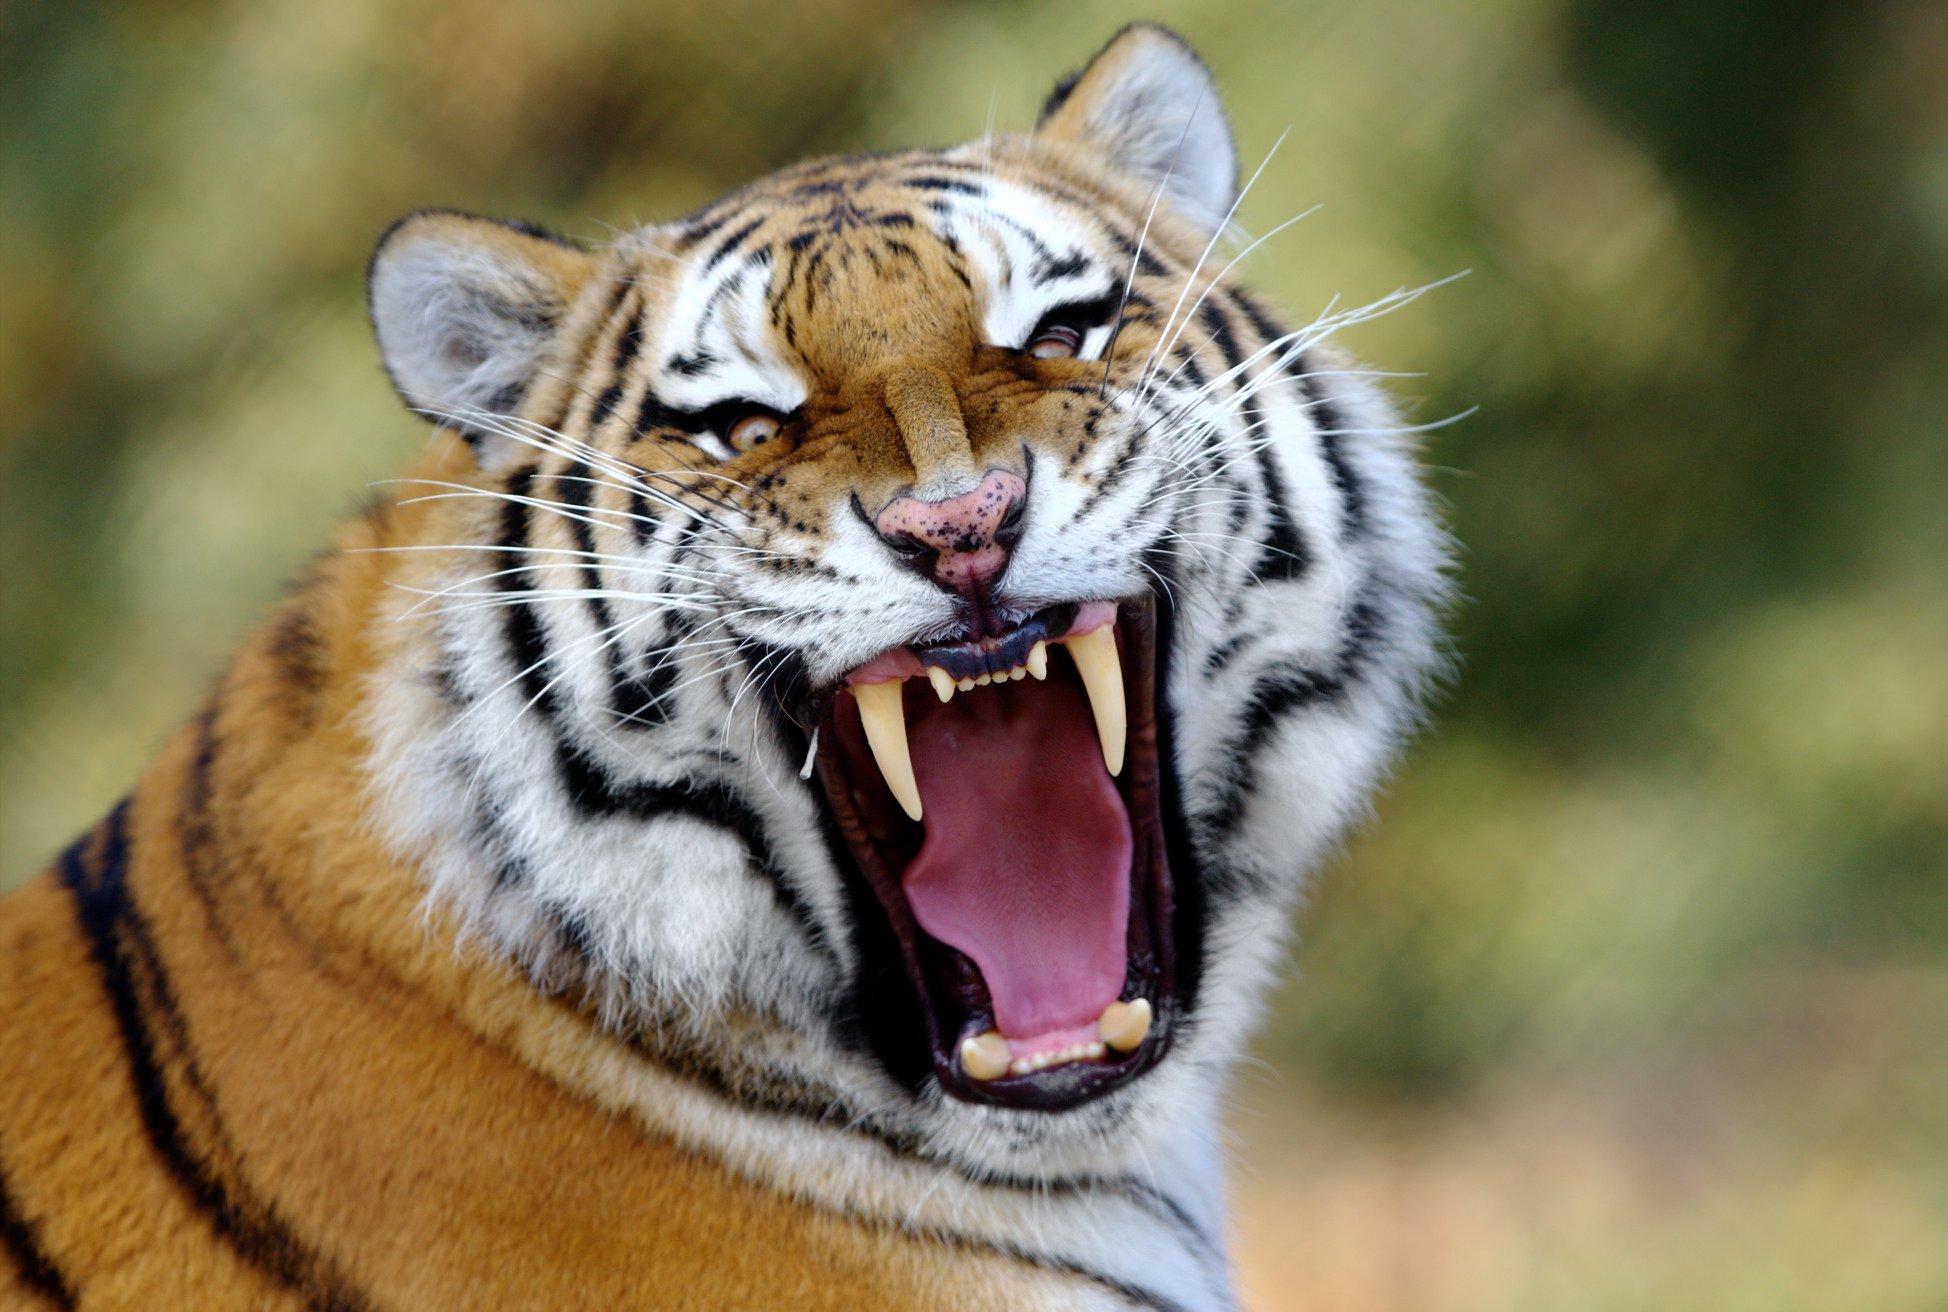 Protecting Amur Tigers